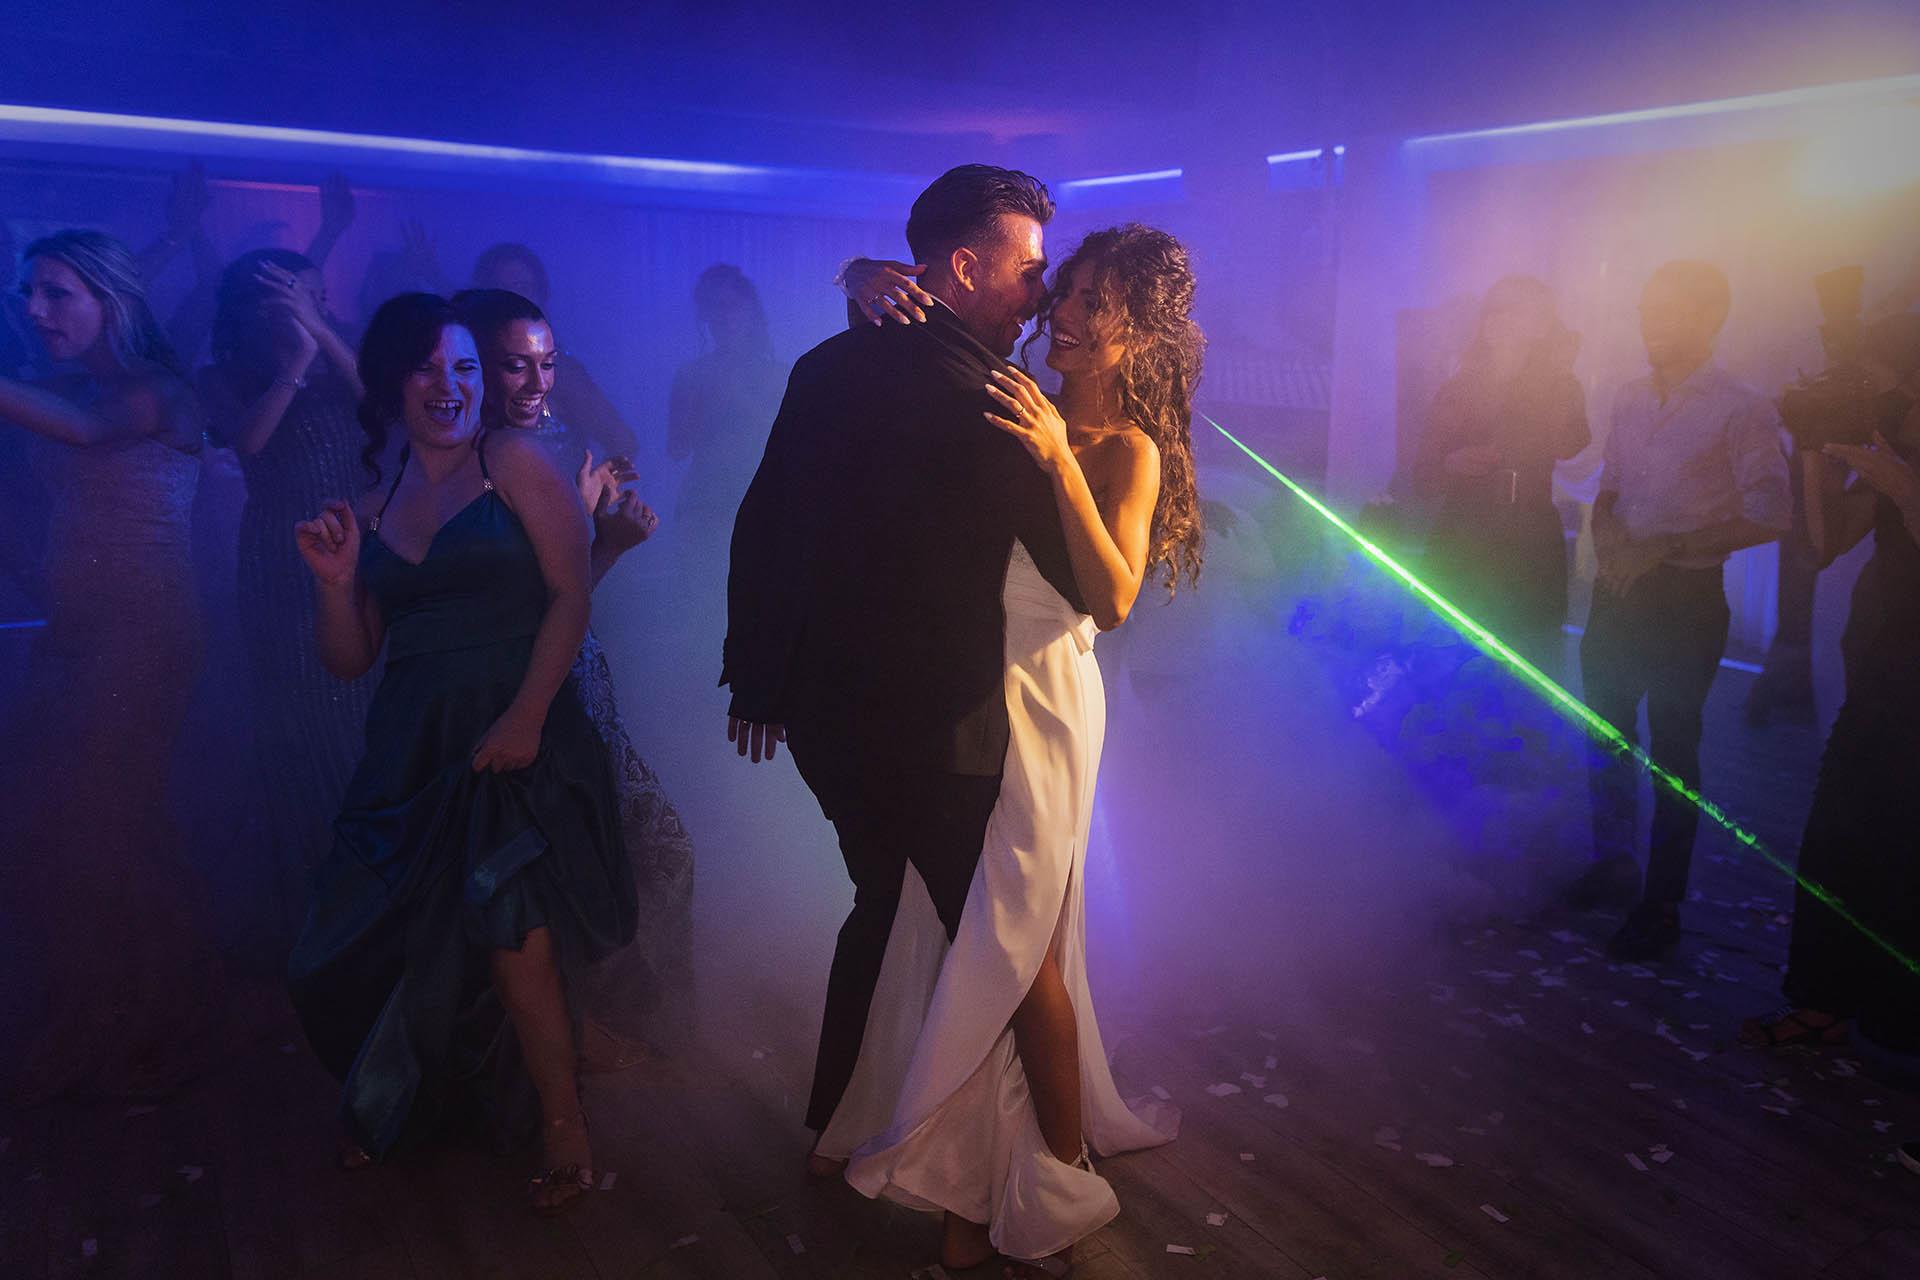 Wedding in Italy, Best Italy wedding photographer, Victor Lax, Tuscany wedding photographer, Puglia wedding photographer, Positano wedding photographer